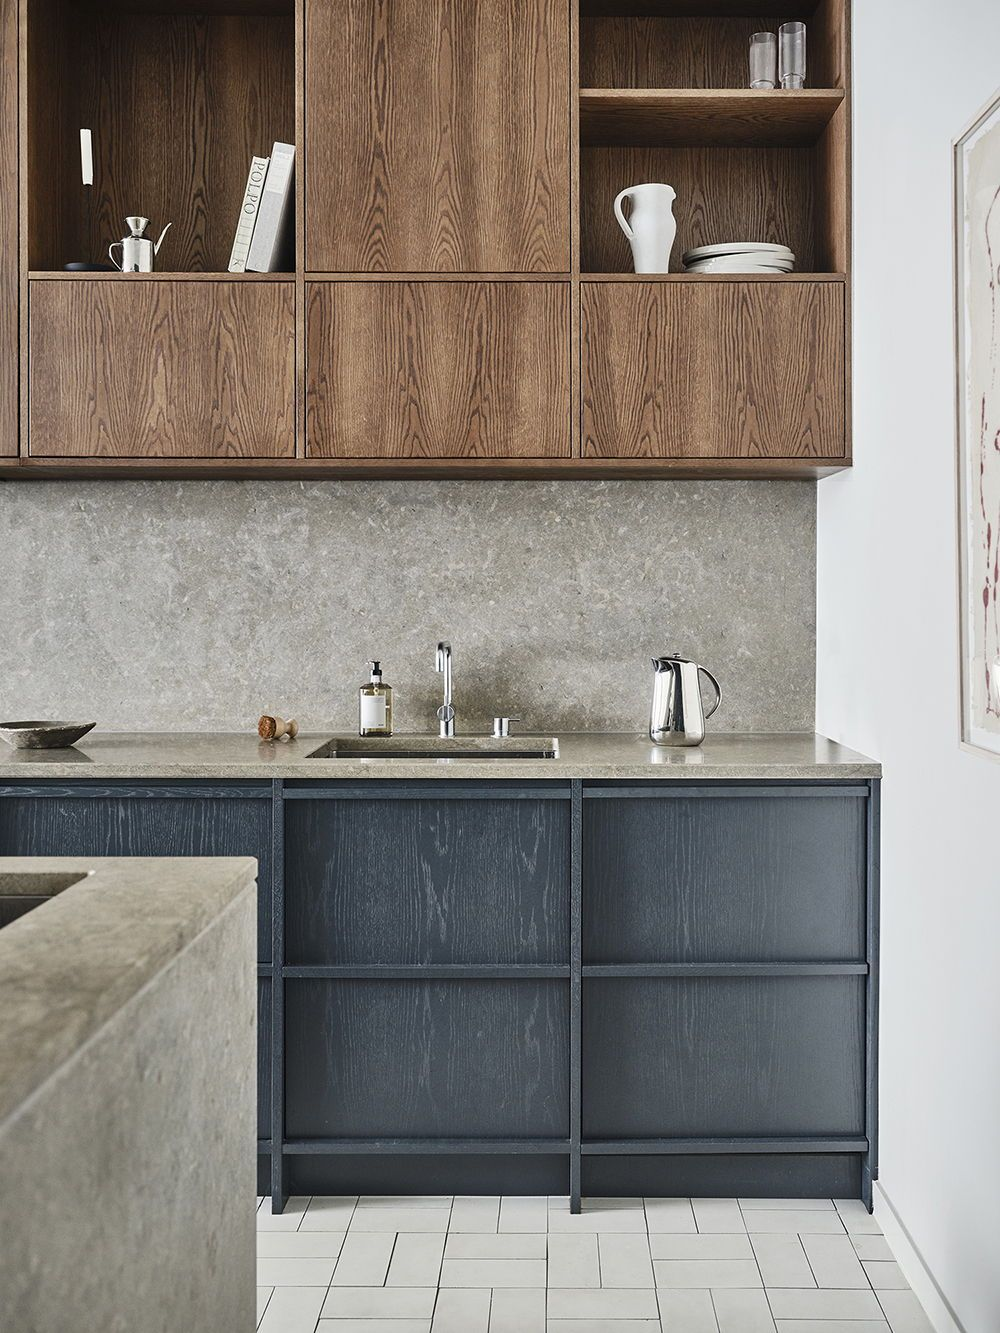 The Oak Kitchens By Nordiska Kok Oak Kitchen House Interior